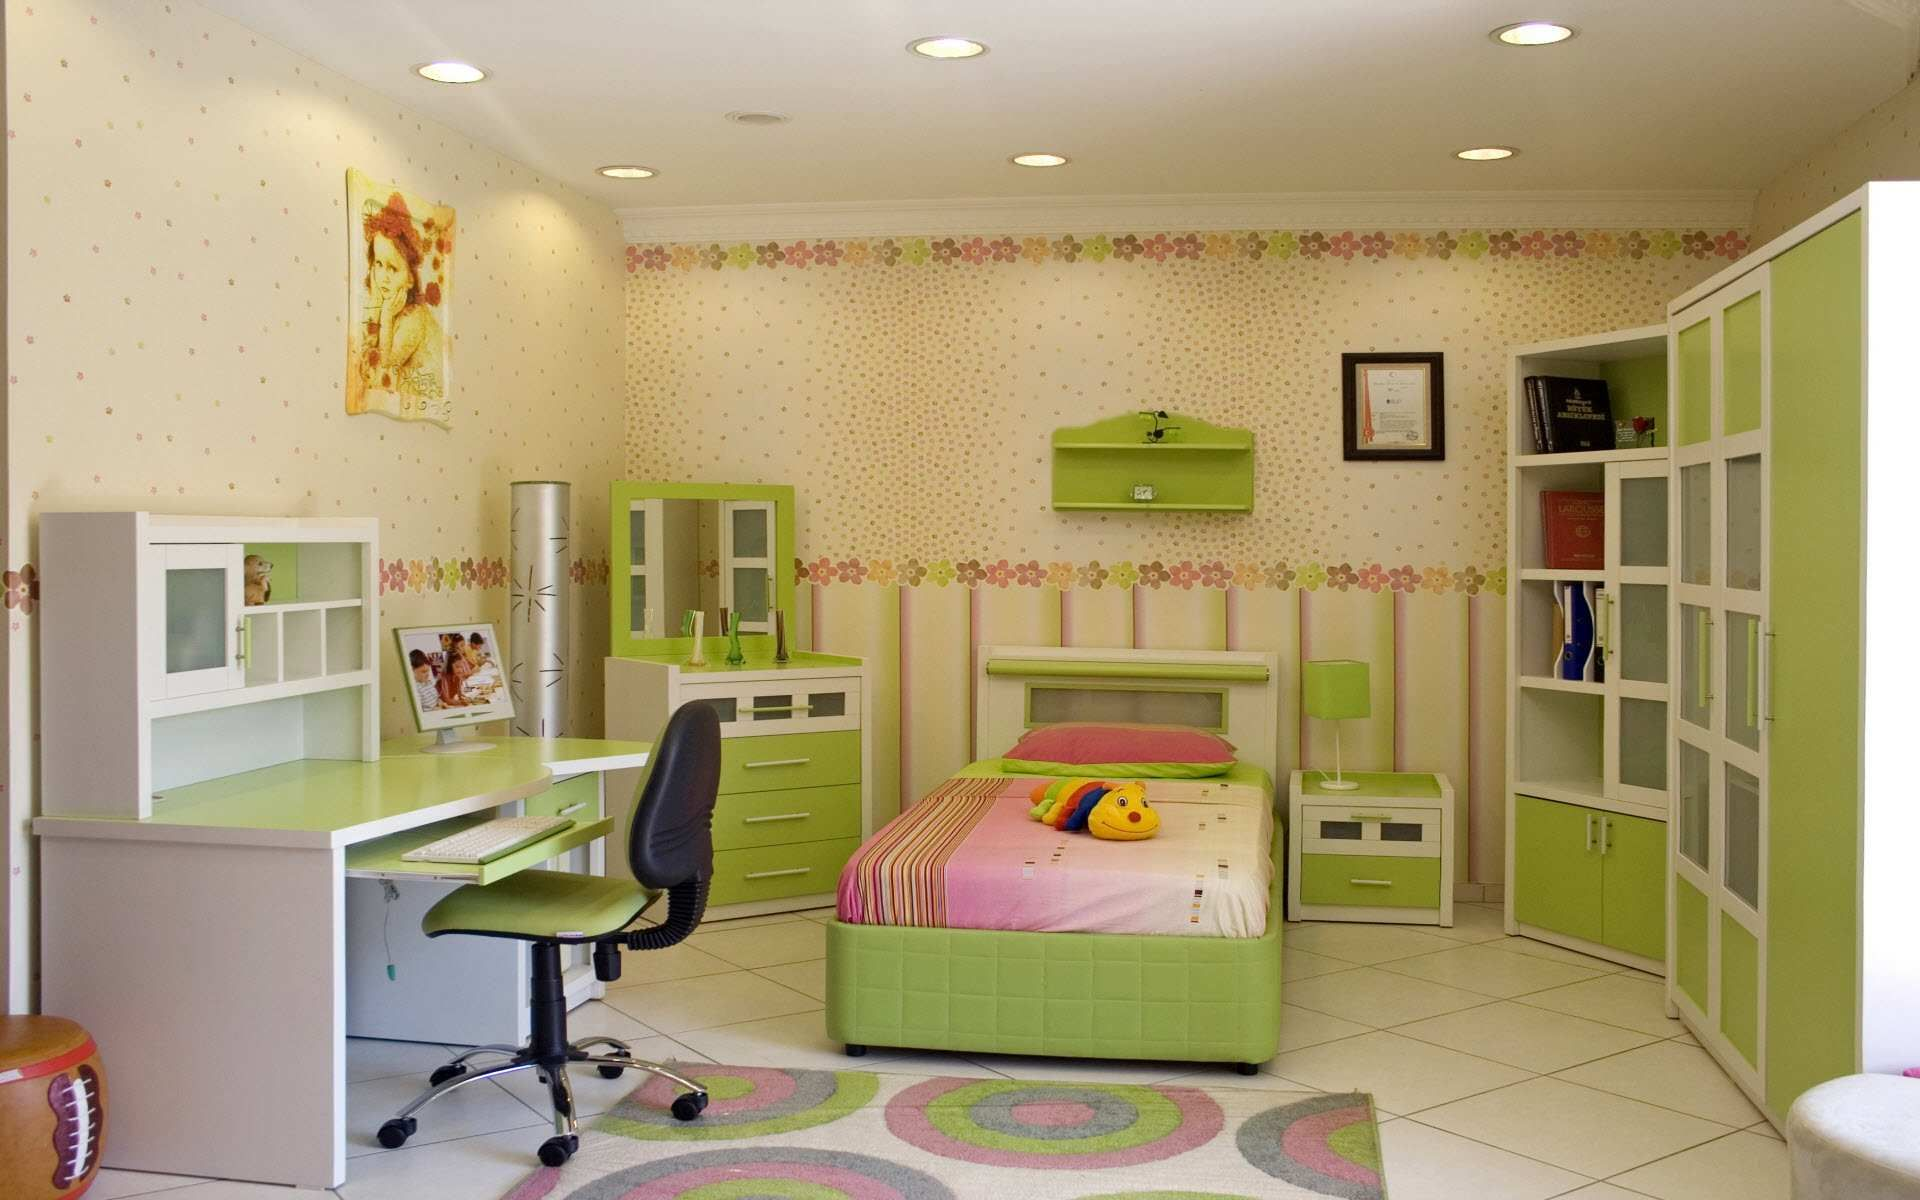 home interior | home interior design ideas stylish home designs Best ...